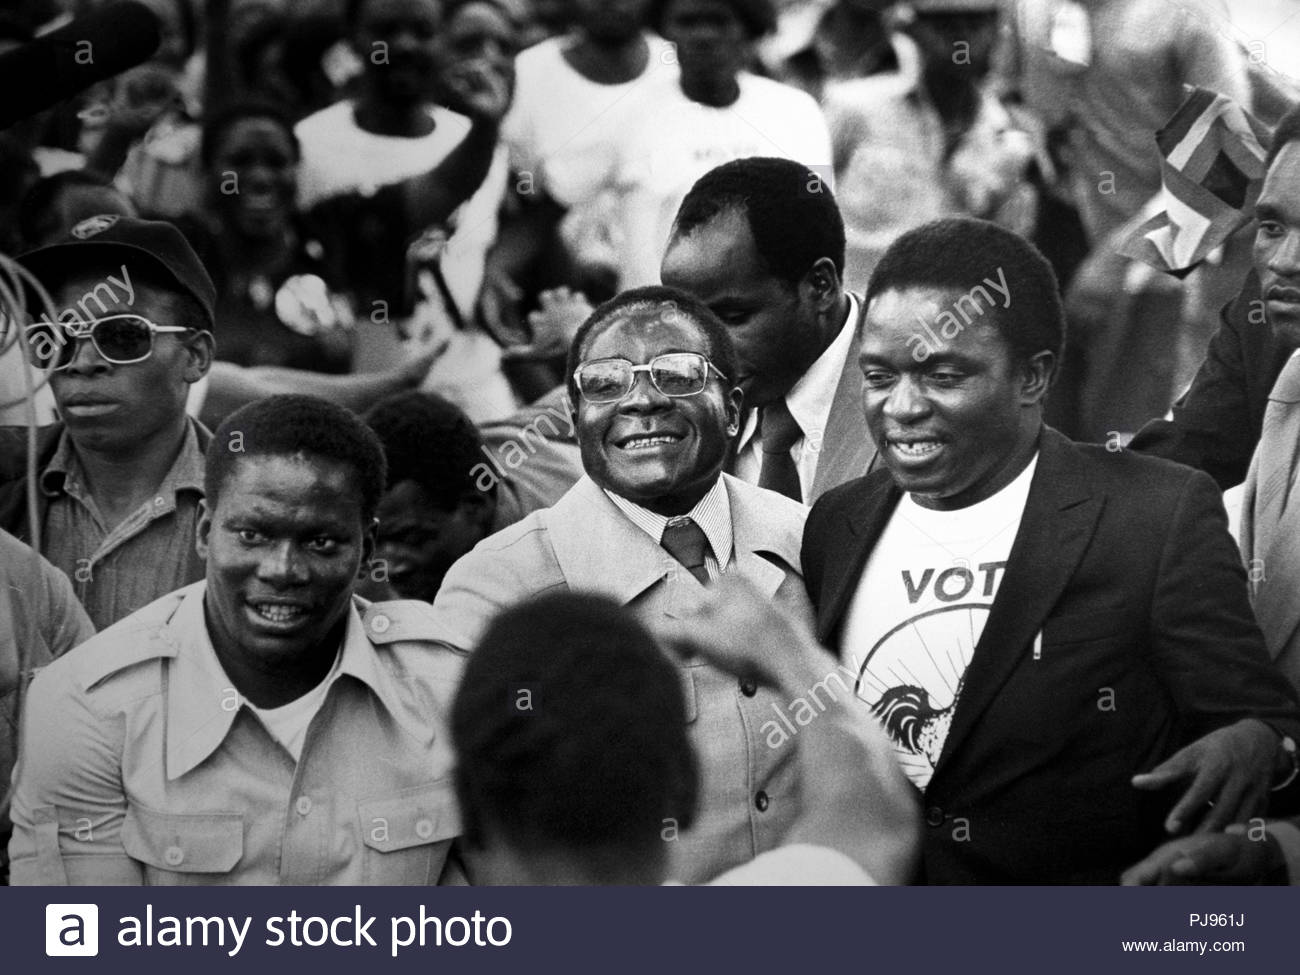 Robert Mugabe arrives back in (Salisbury Rhodesia), Harare Zimbabwe from exile in 1980. Emerson Mnangagwa the new President of Zimbabwe is on the left of Mugabe COPYRIGHT PHOTOGRAPH BY BRIAN HARRIS  © 07808-579804 - Stock Image